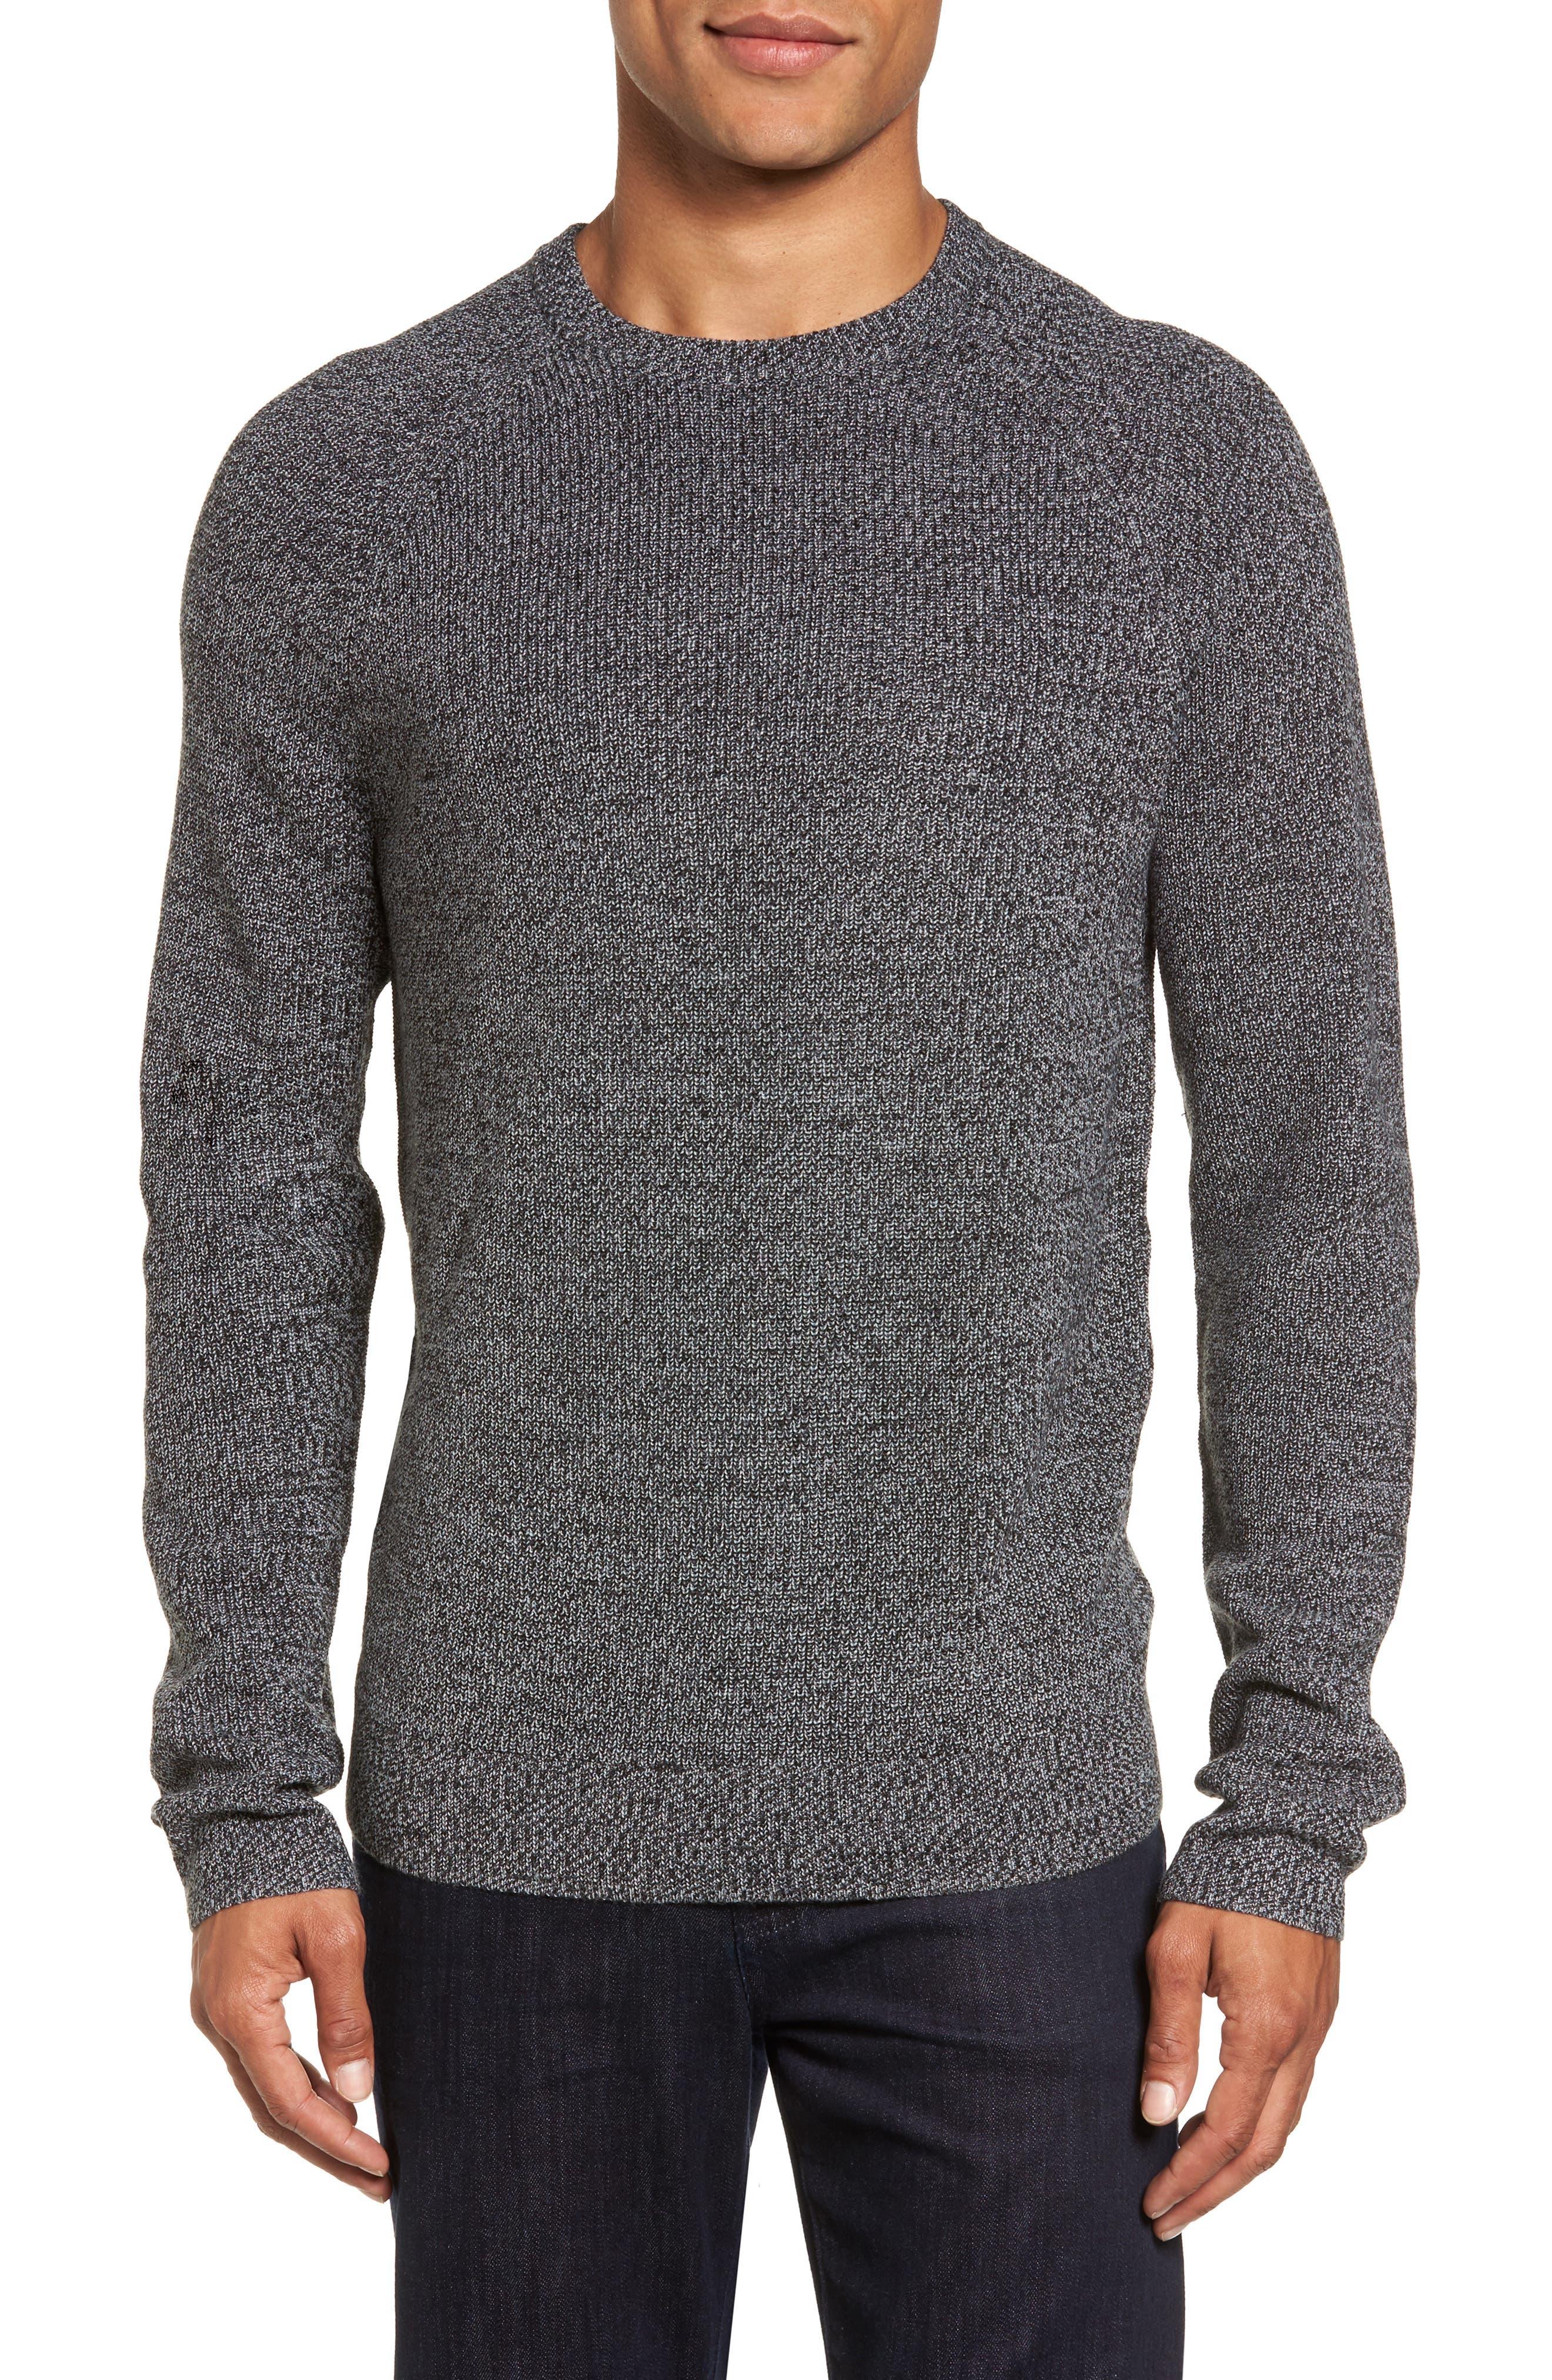 Alternate Image 1 Selected - Nordstrom Men's Shop Textured Merino Wool Blend Sweater